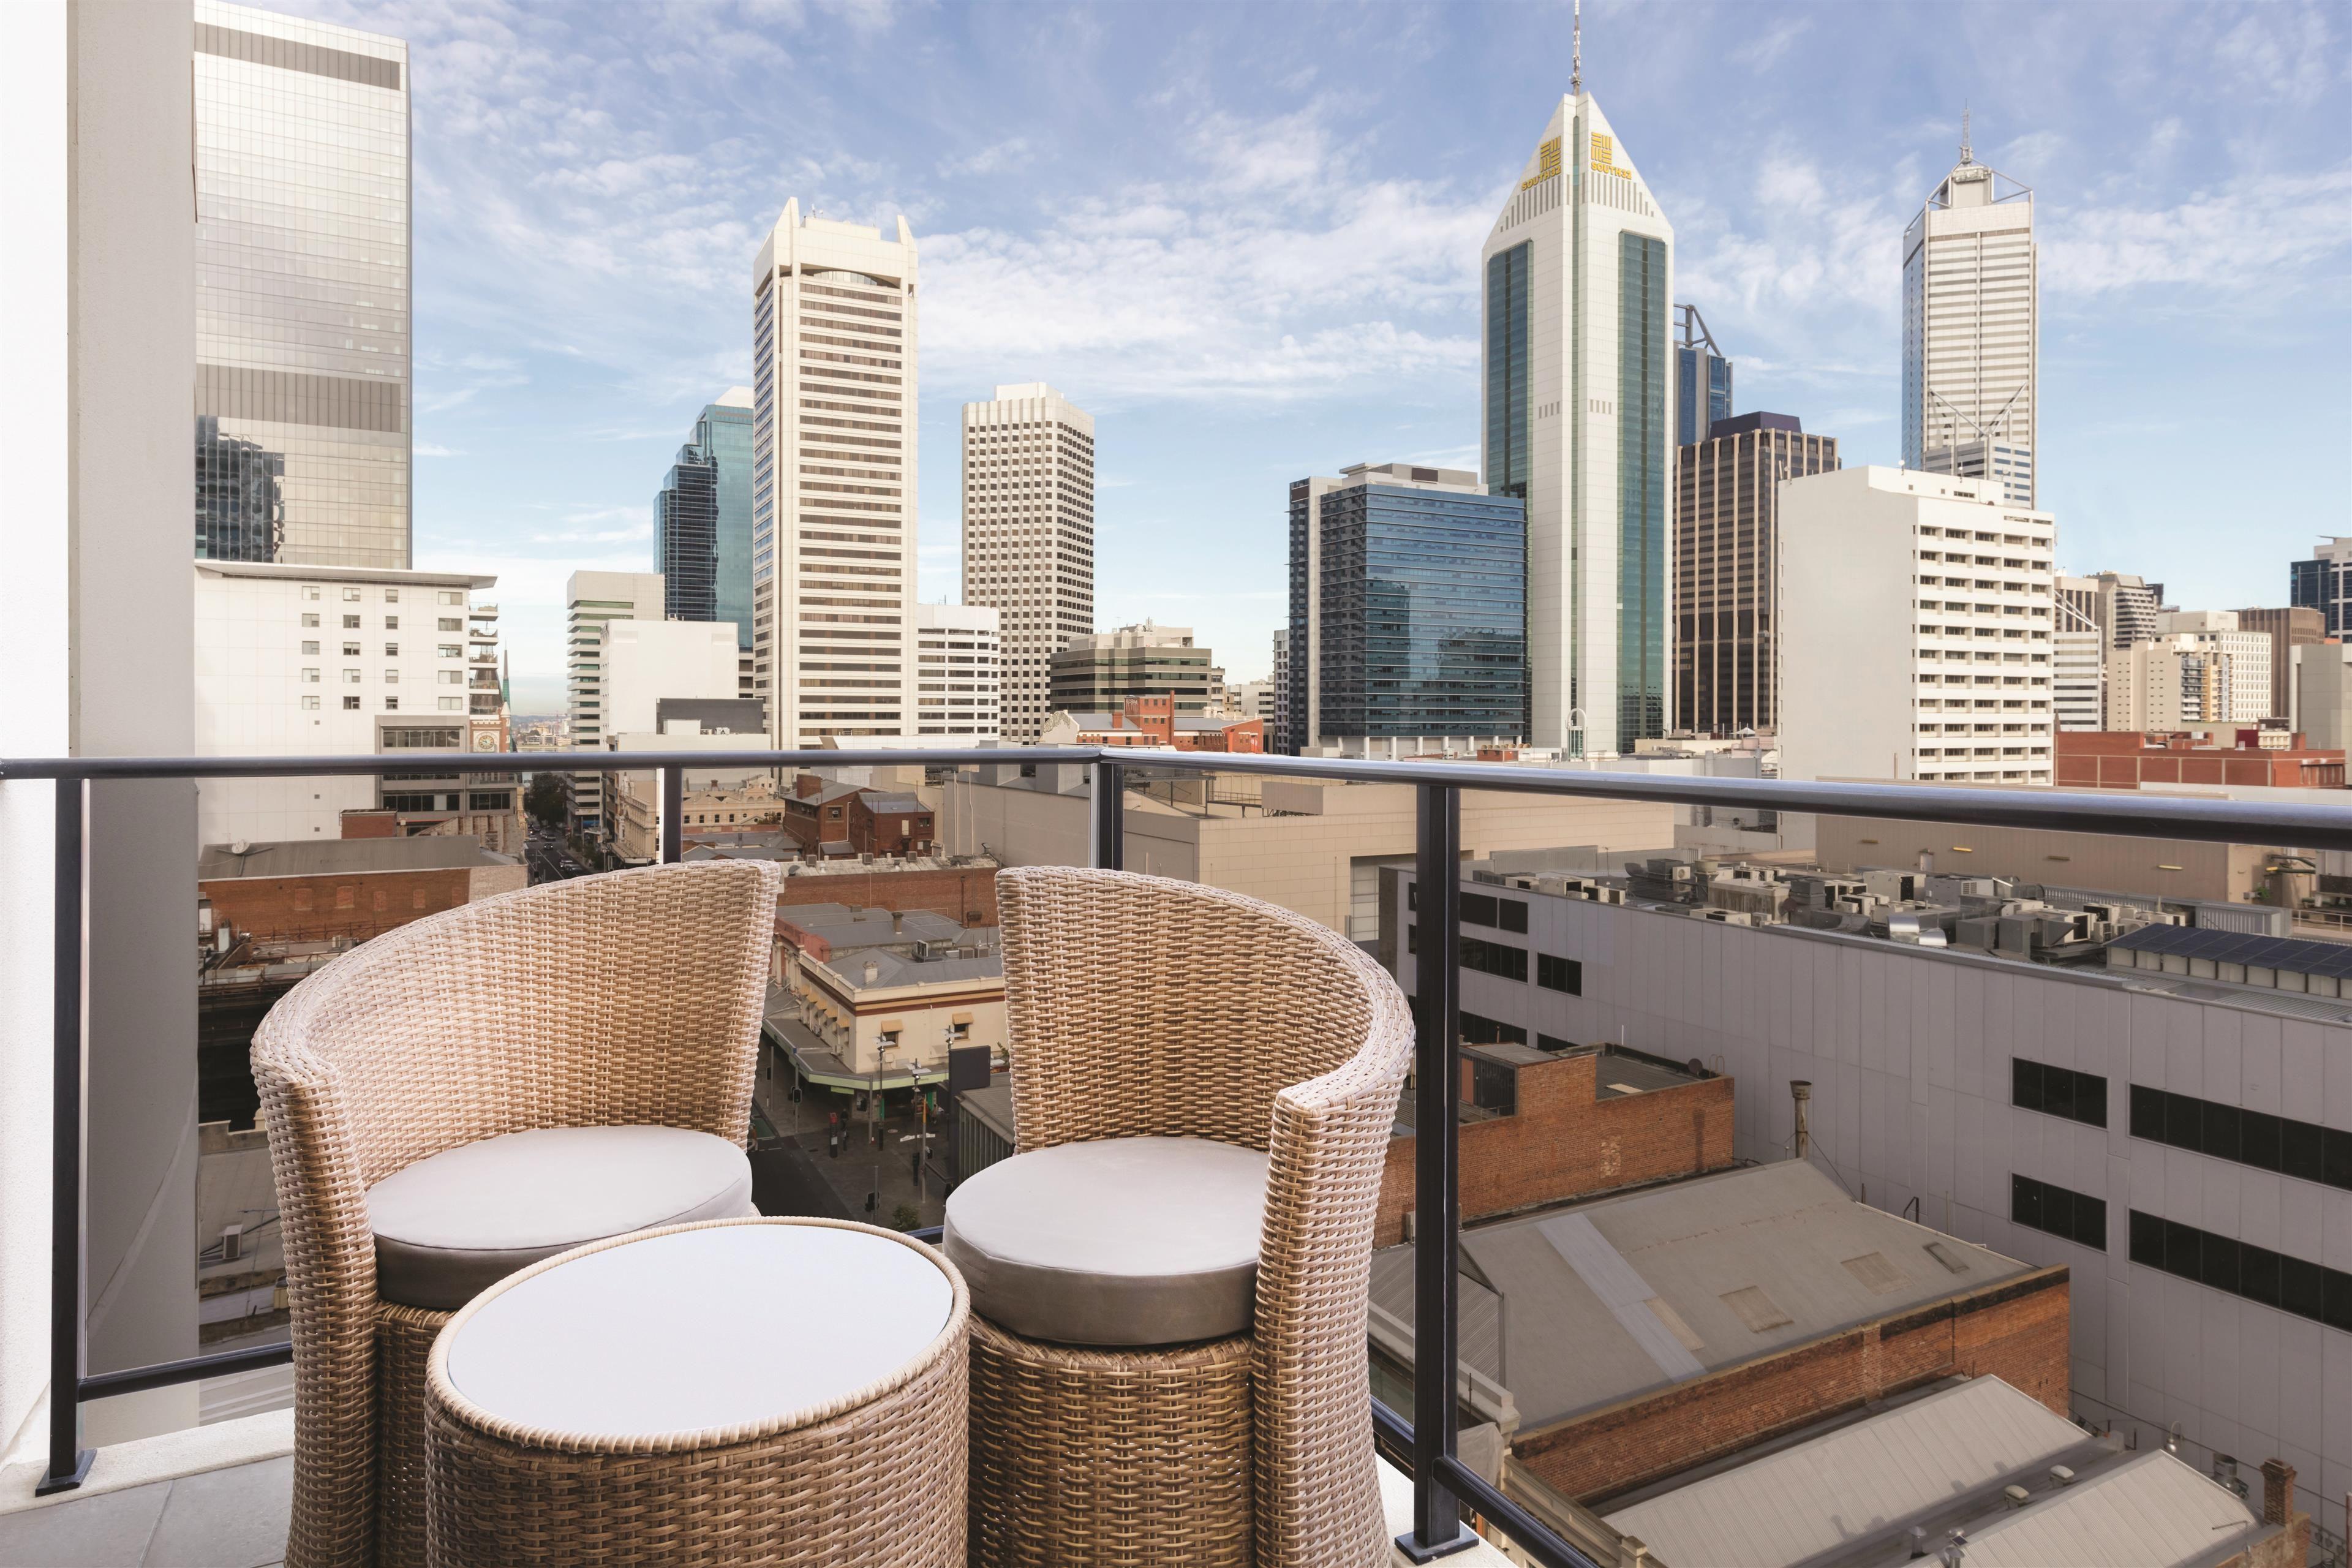 Courtesy of Adina Apartment Hotel Perth Barrack Plaza / Expedia.com